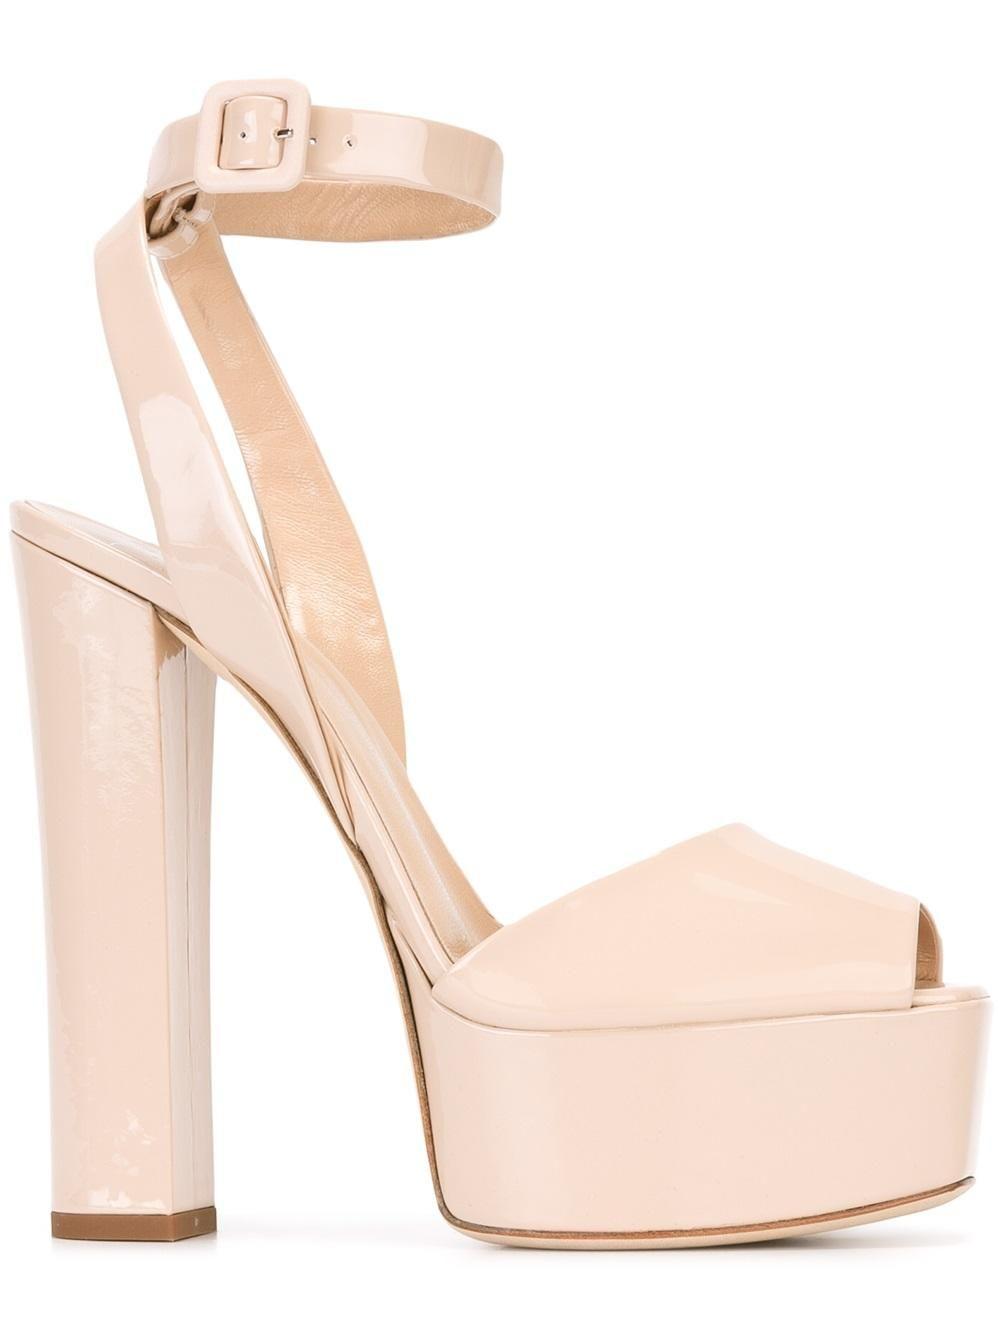 9ddd1838b Giuseppe Zanotti Design  betty  Sandals - Stivali - Farfetch.com ...